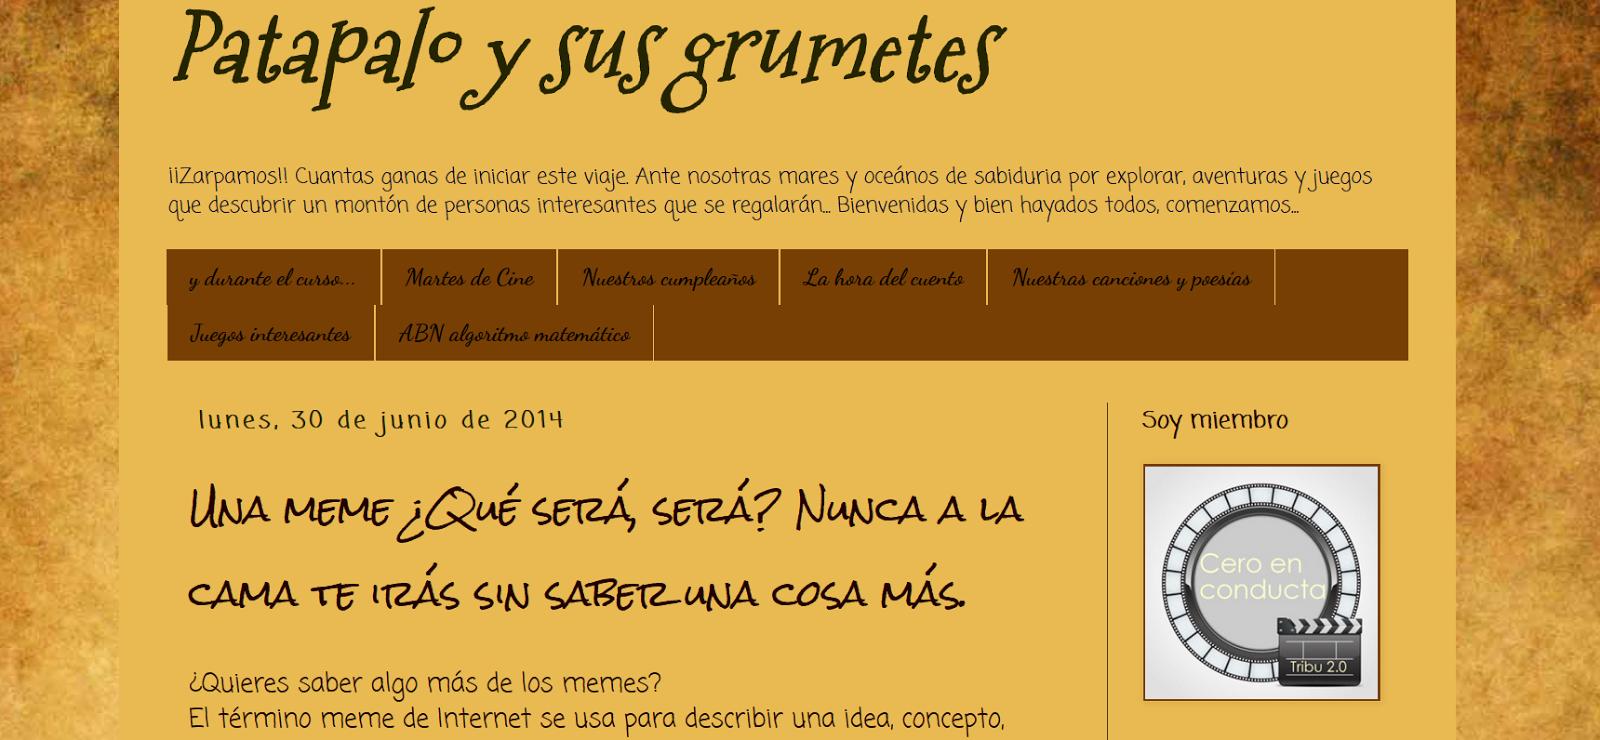 http://patapaloysusgrumetes.blogspot.com.es/2014/06/prueba.html